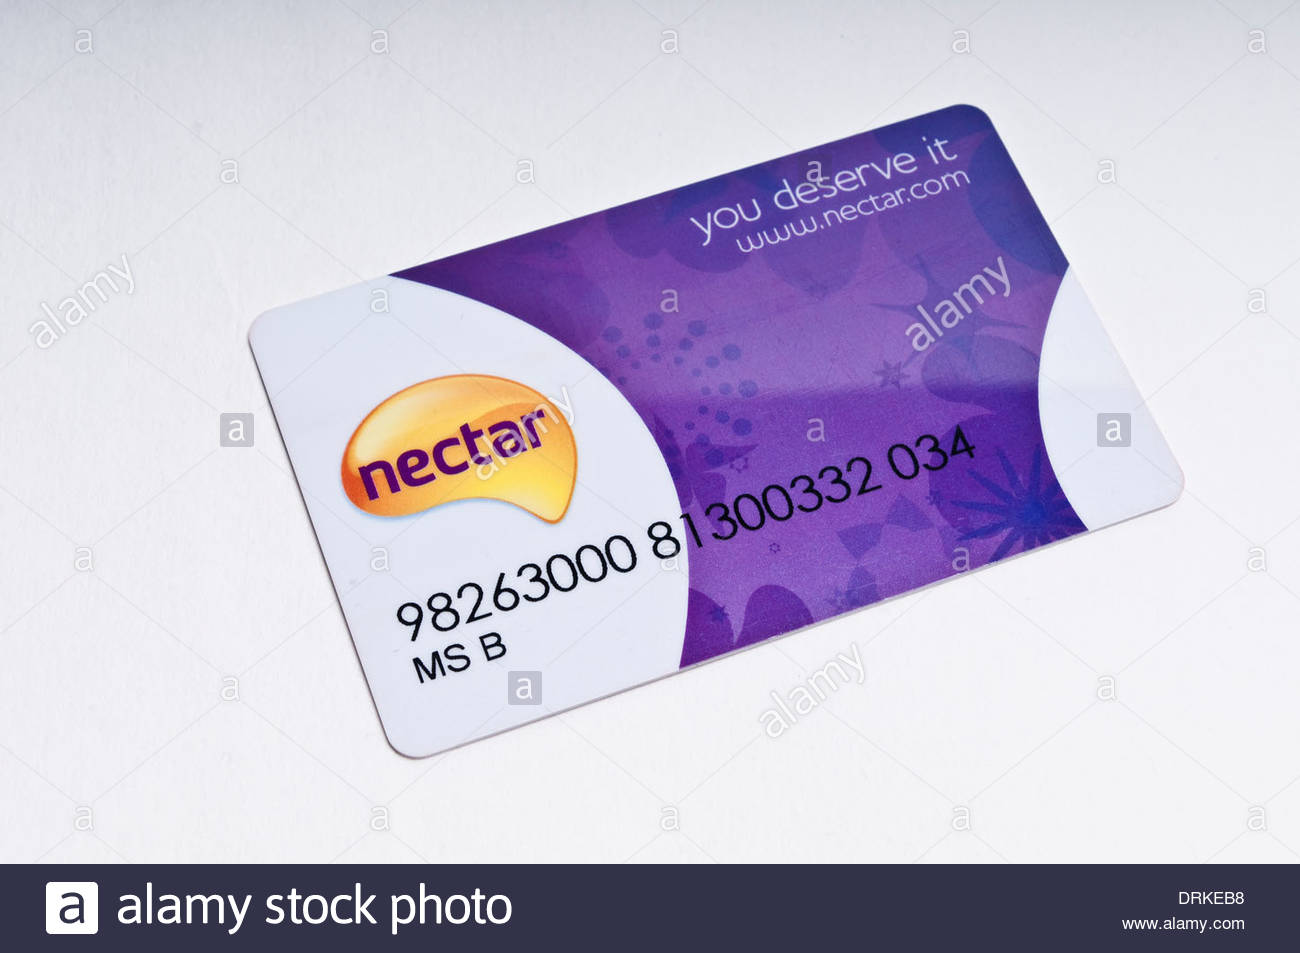 Nectar store loyalty card Stock Photo: 66196572 - Alamy